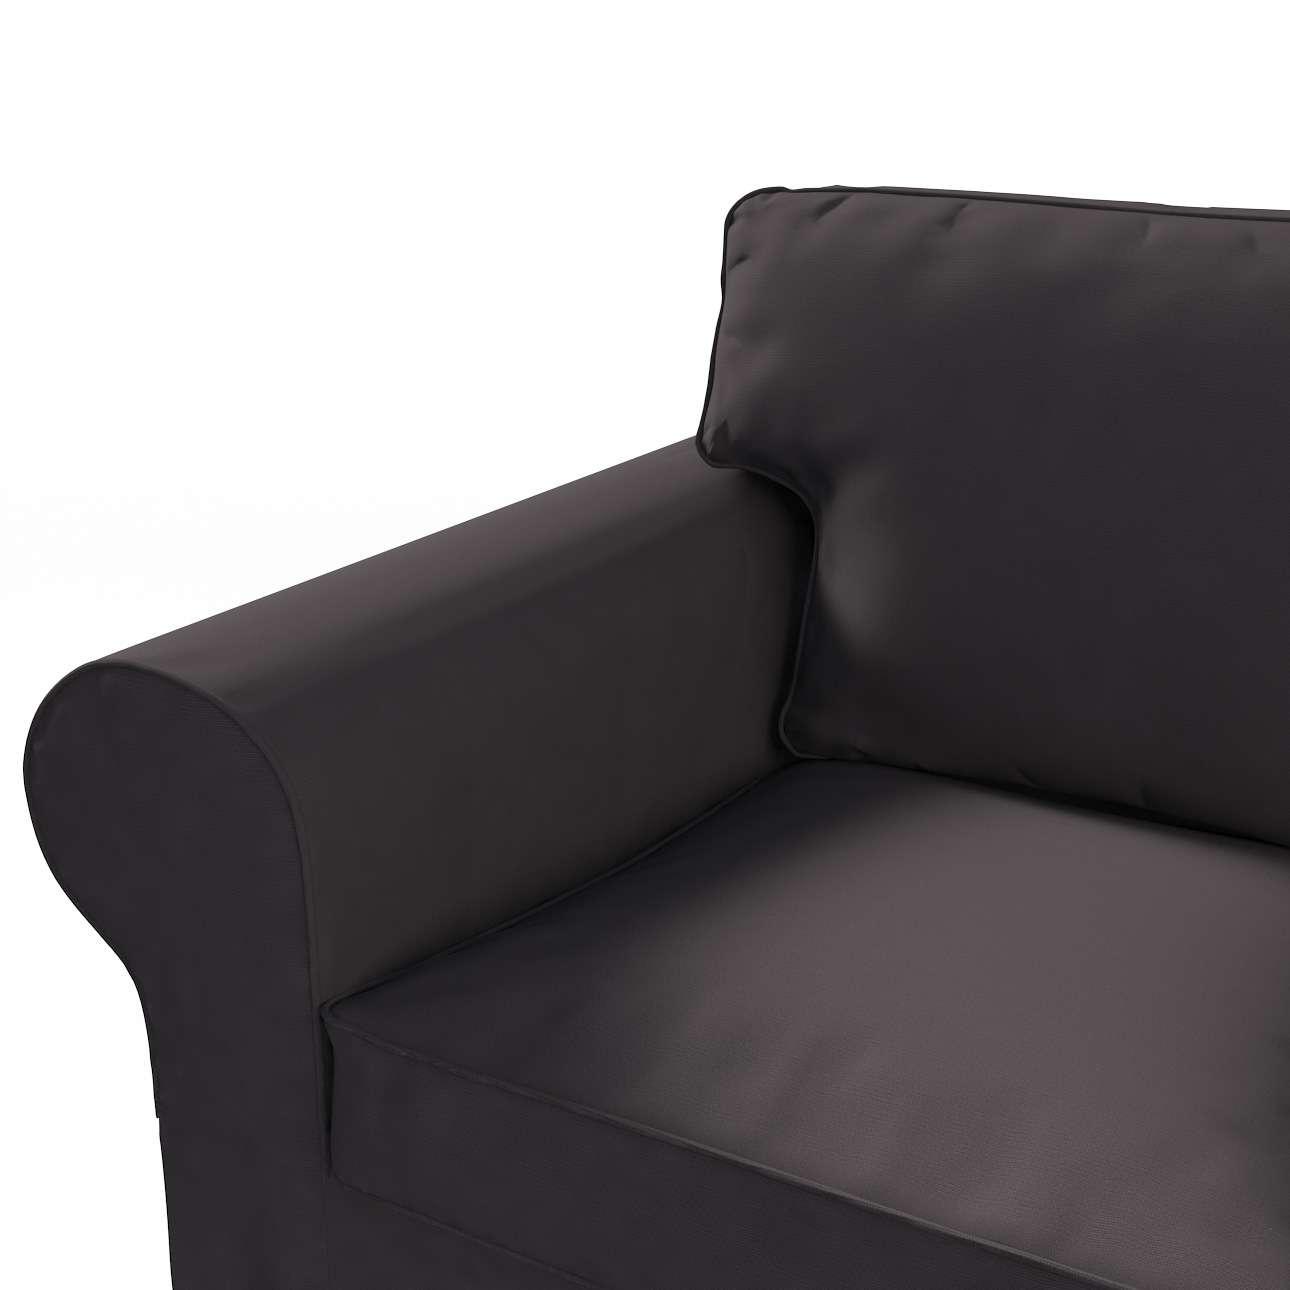 Ektorp 3-Sitzer Schlafsofabezug neues Modell (2013) Ektorp 3-Sitzer, ausklappbar, neues Modell ( 2013) von der Kollektion Cotton Panama, Stoff: 702-09